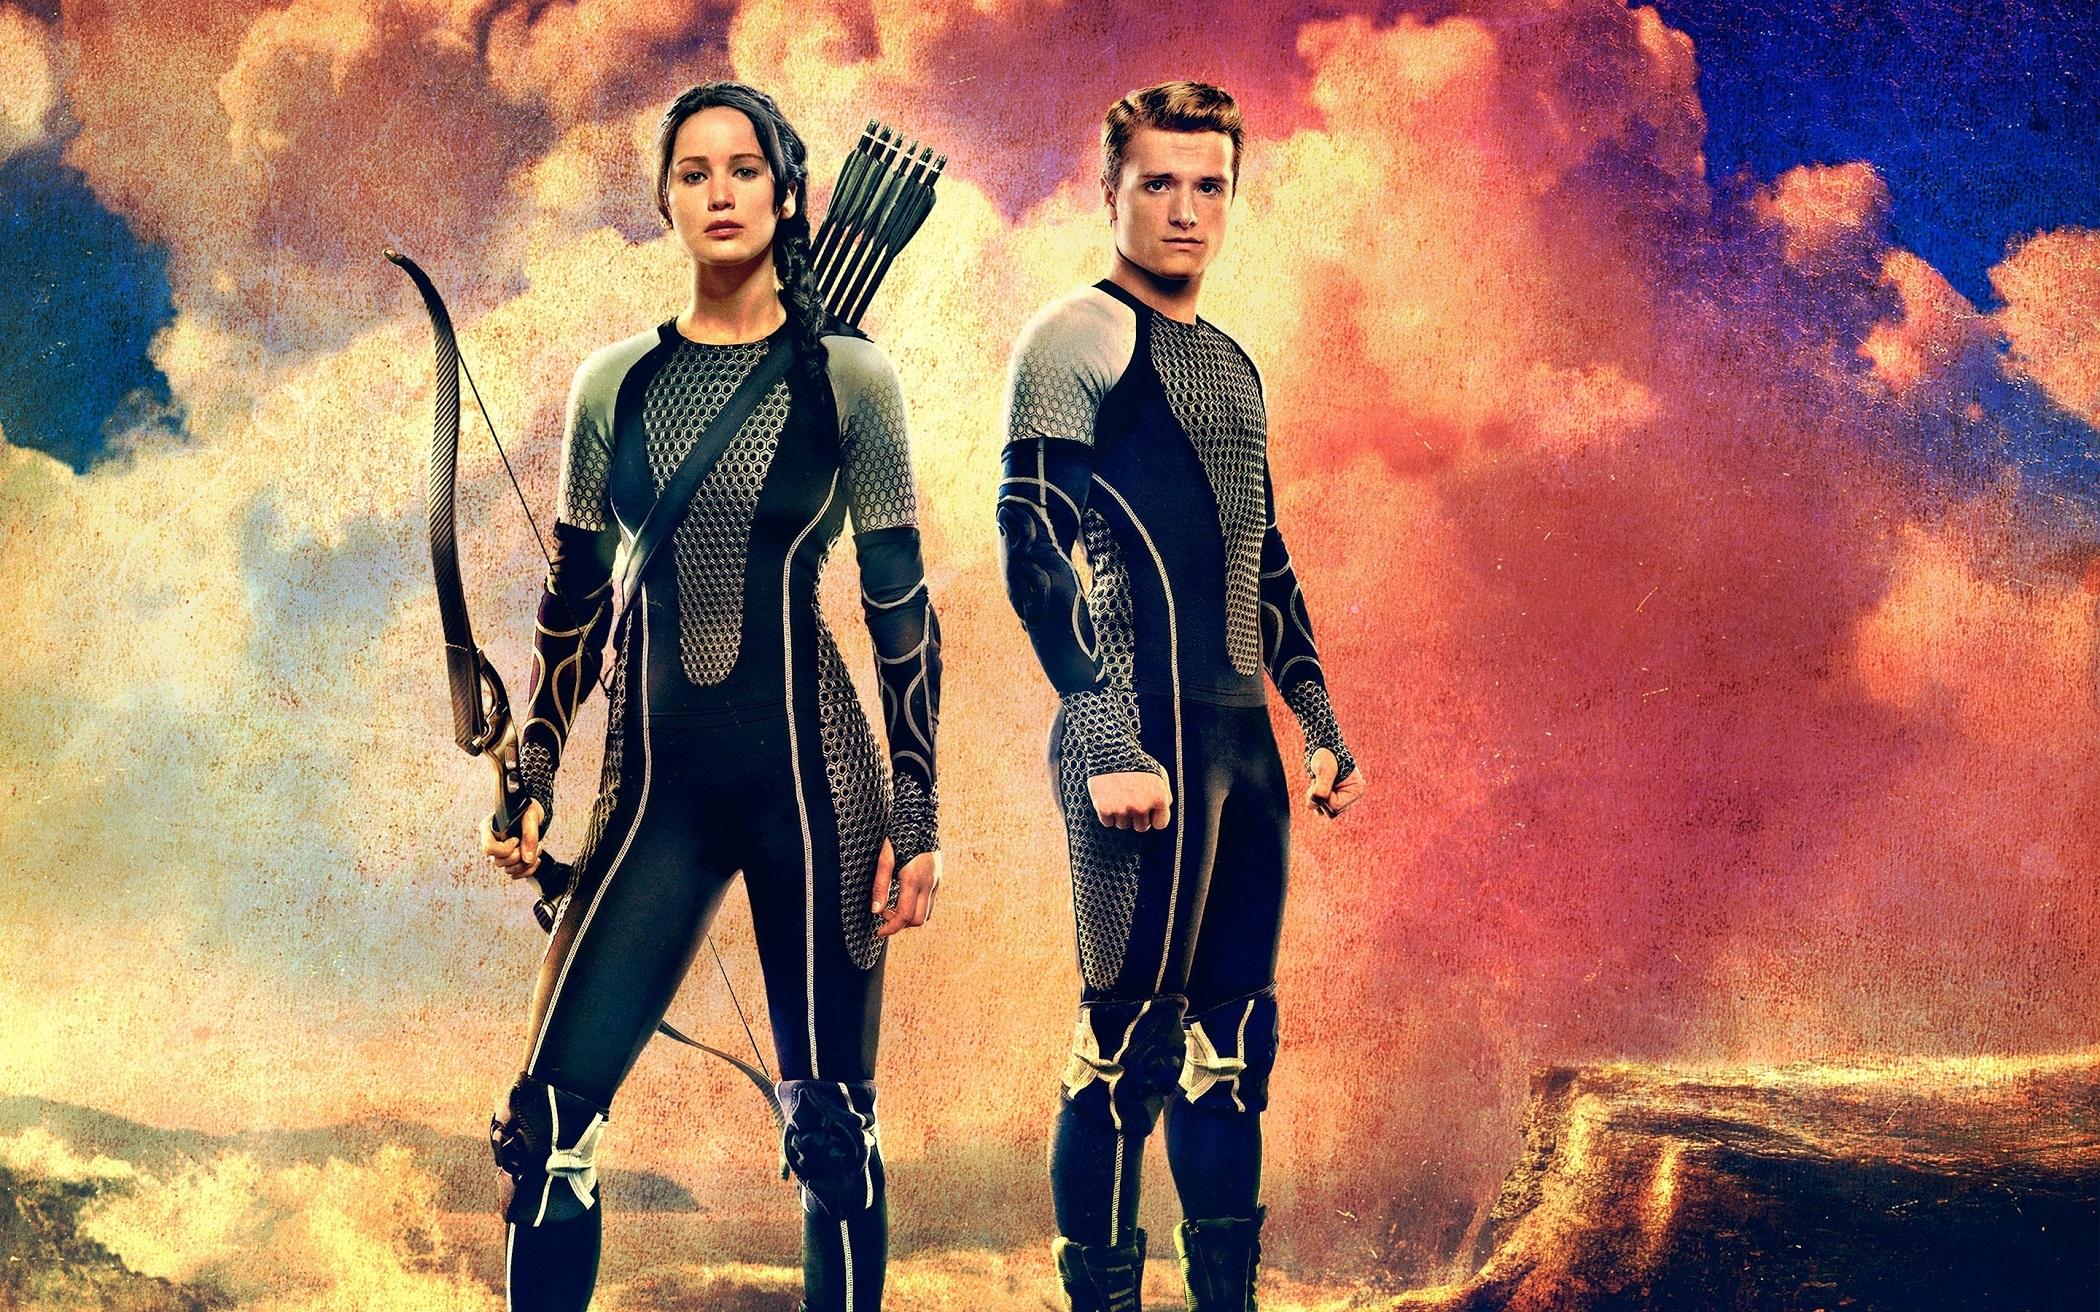 The Hunger Games Wallpaper 22